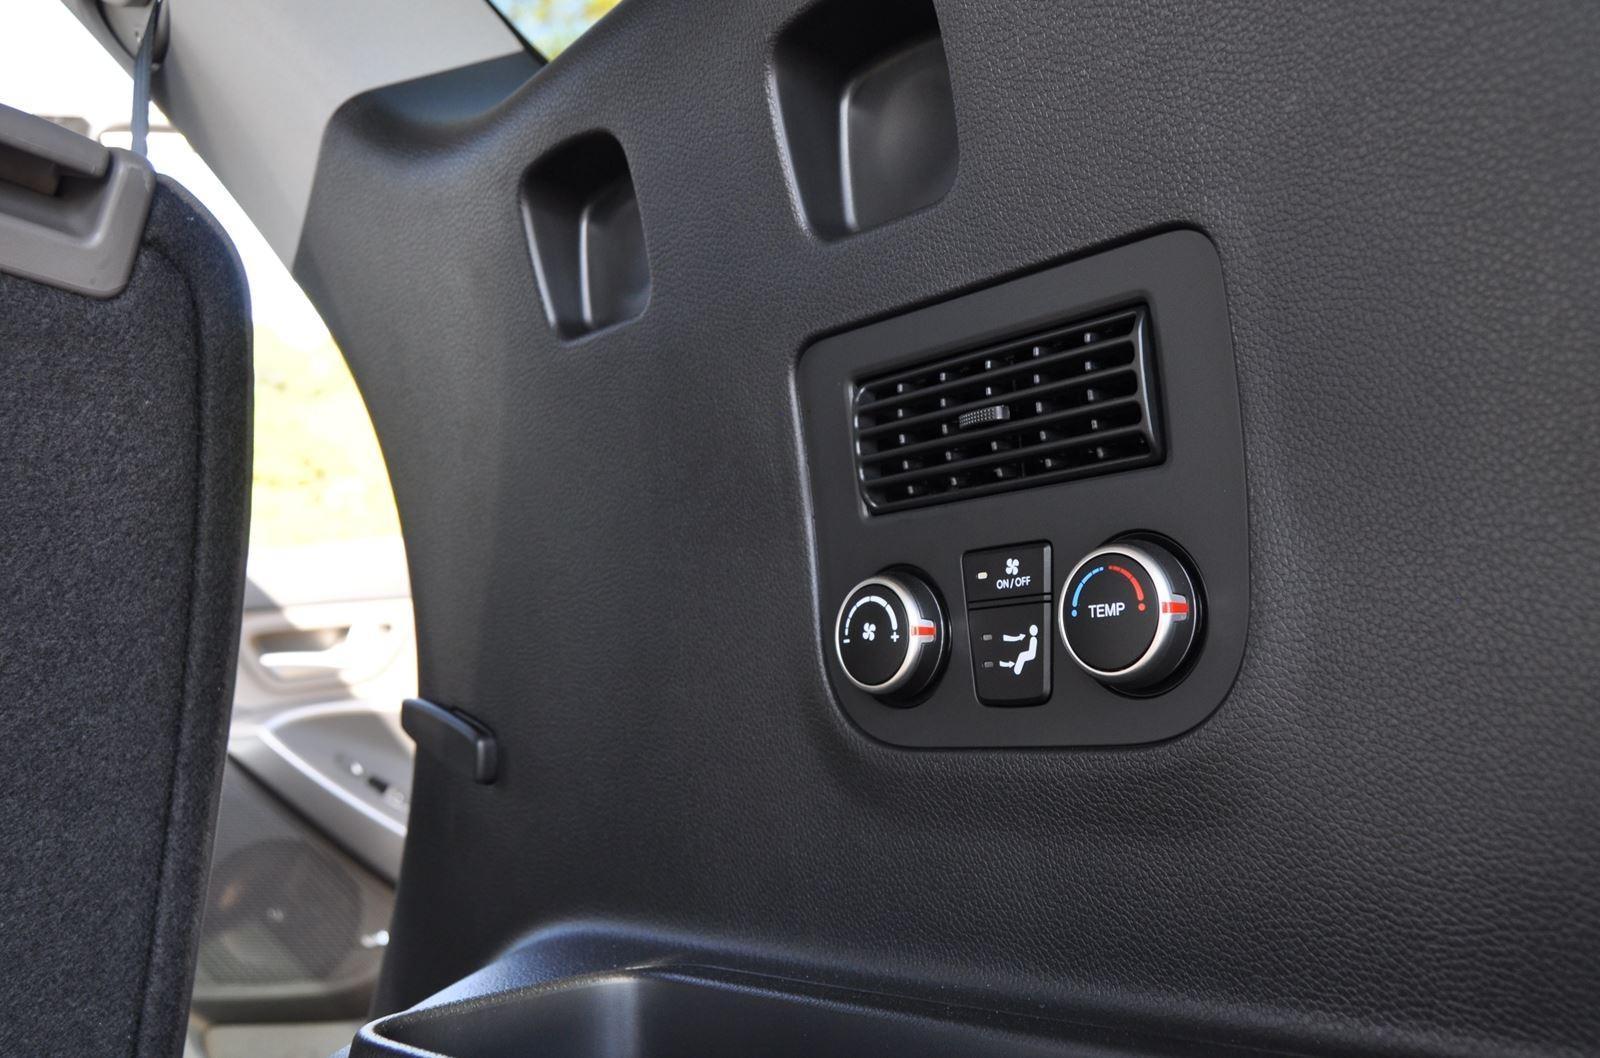 2015 Hyundai Santa Fe LWB Ultimate - Interior Photos 11